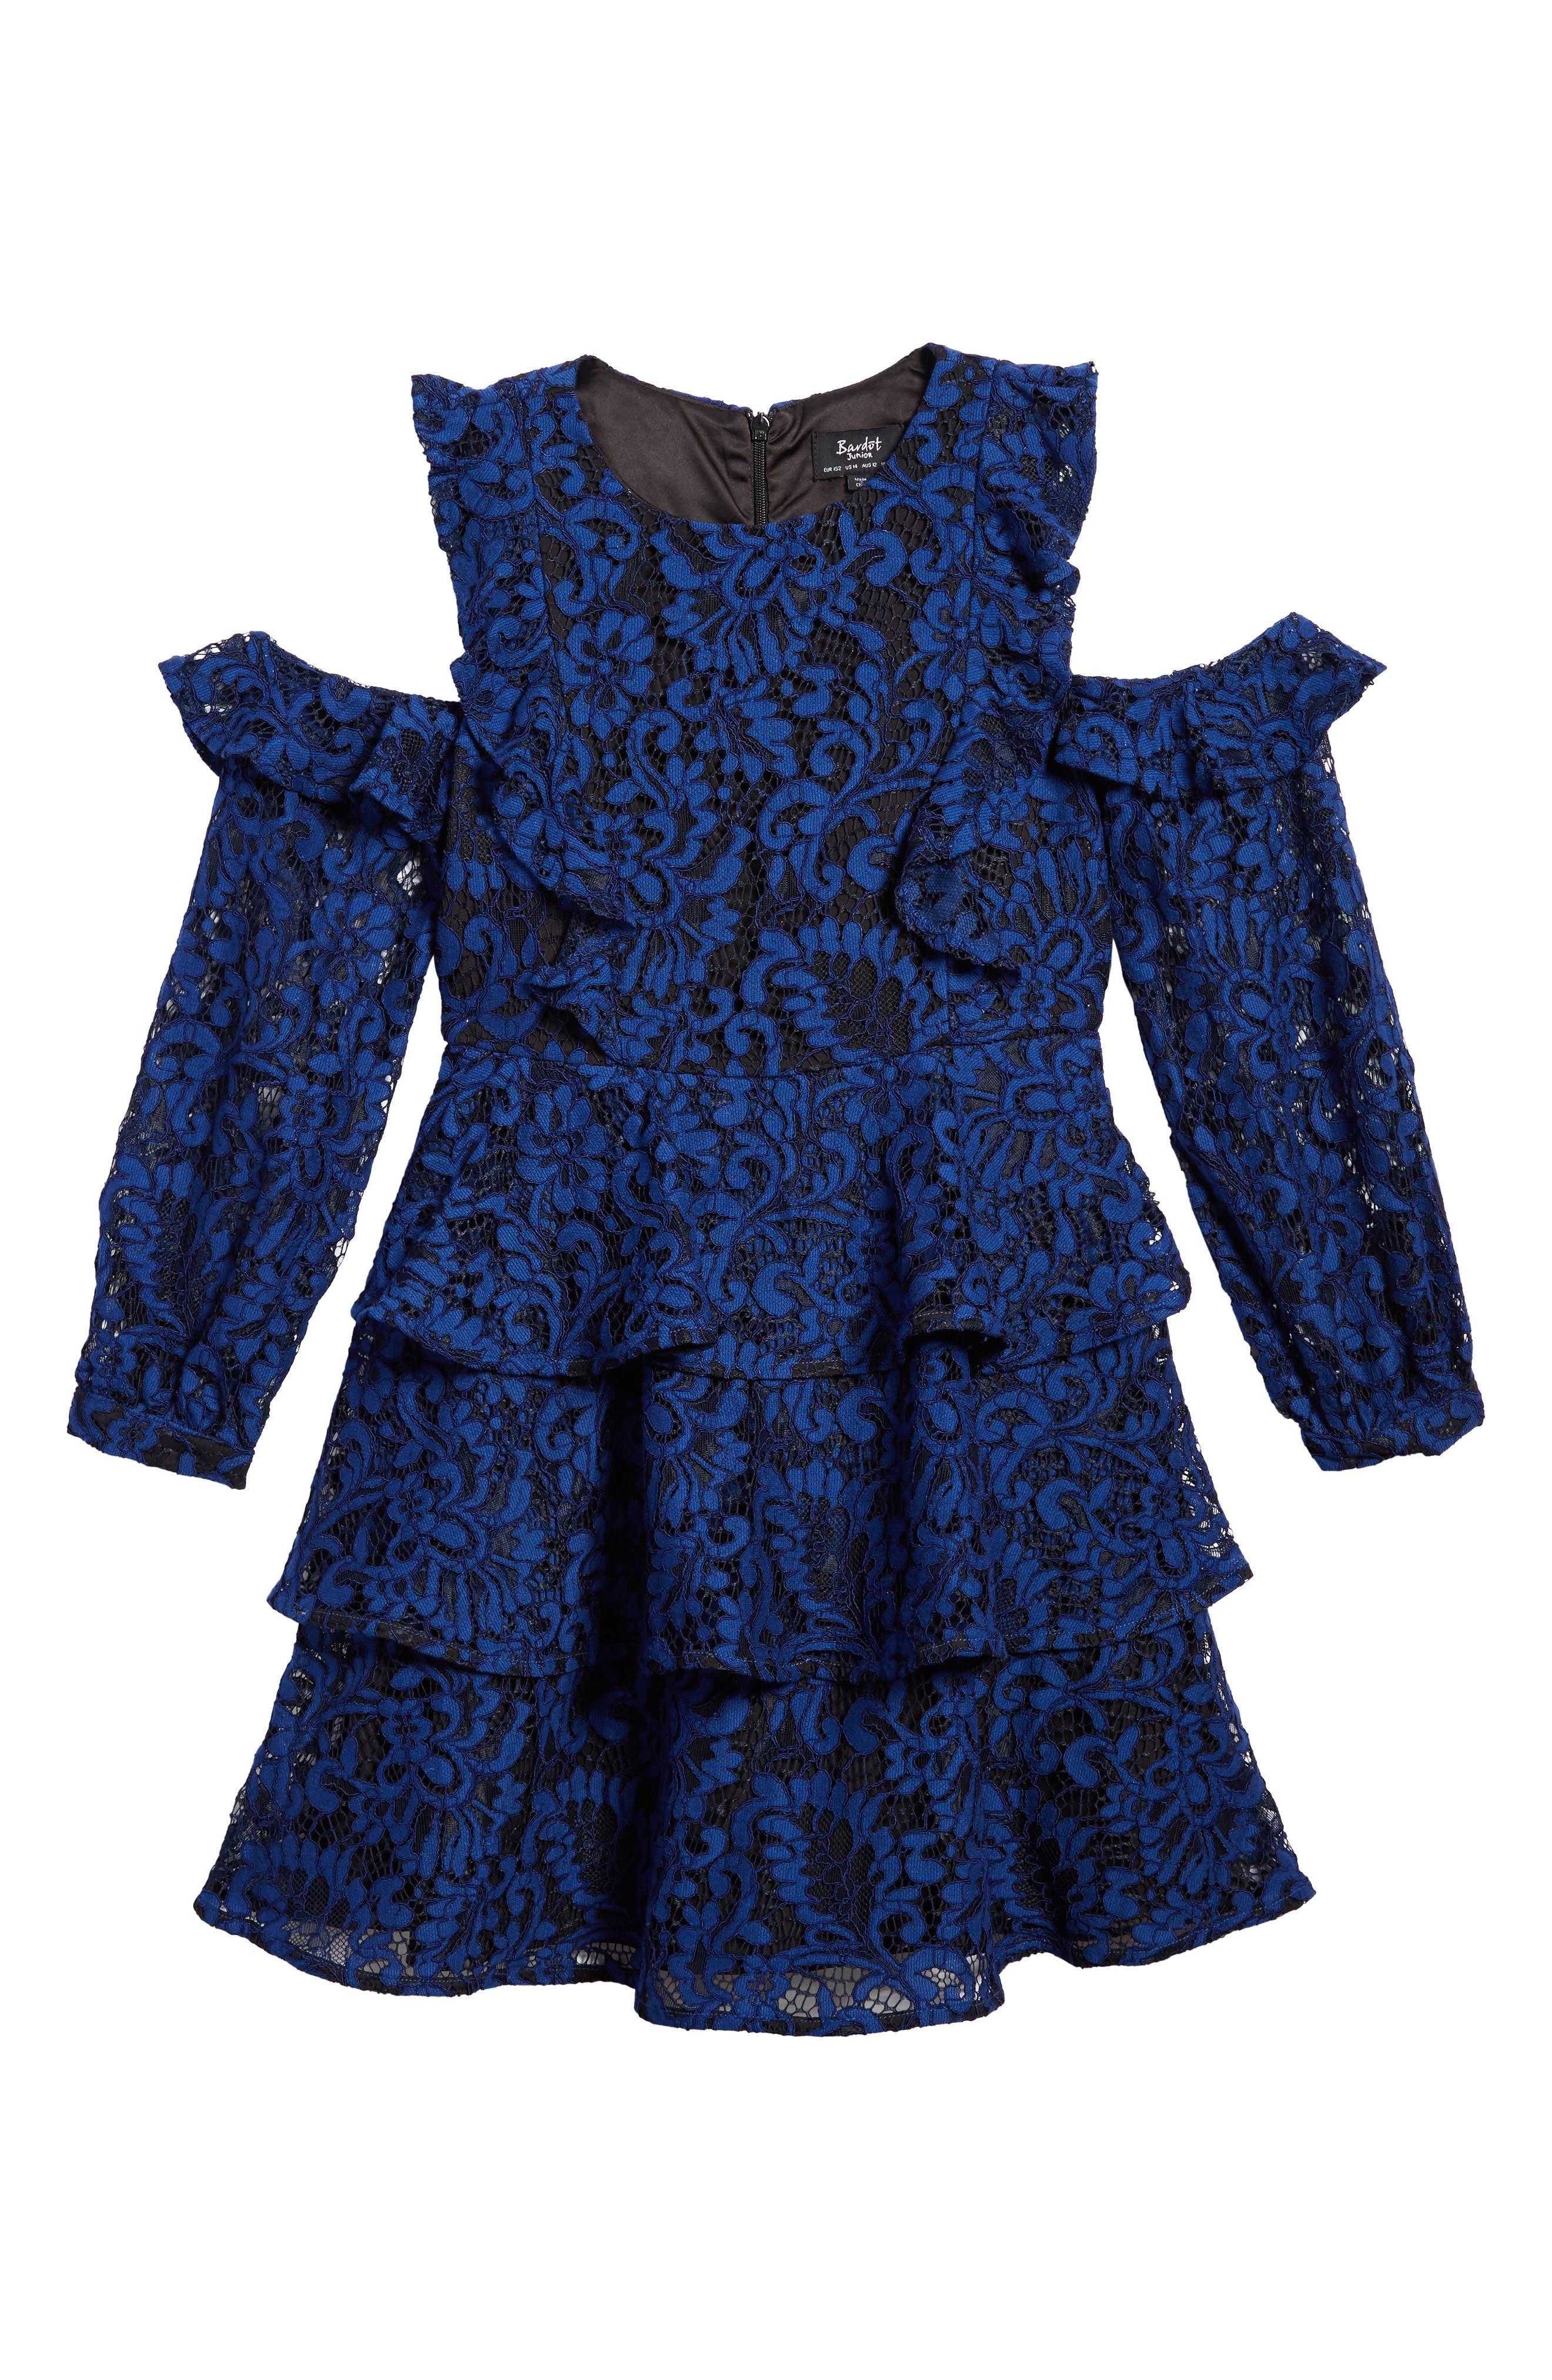 Alternate Image 1 Selected - Bardot Junior Ruffle Lace Cold Shoulder Dress (Big Girls)